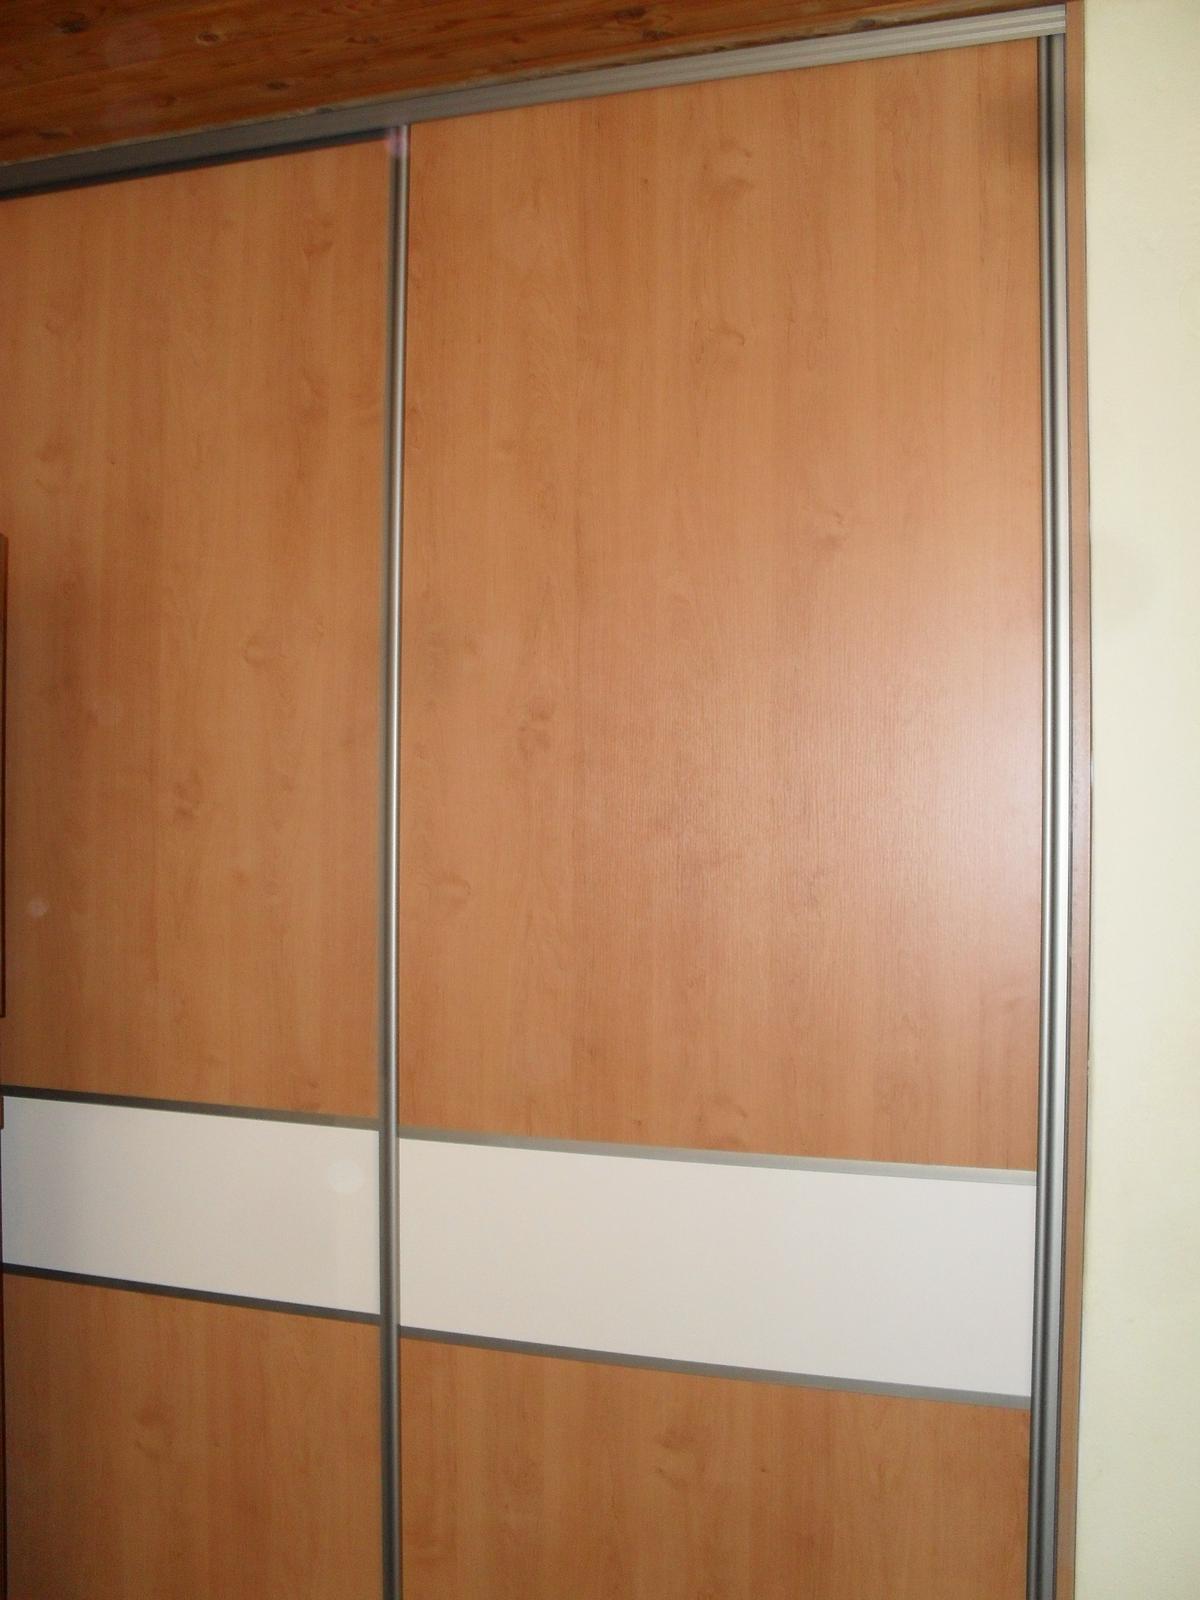 Vstavané skrine Martin Benko Bošany - Obrázok č. 79